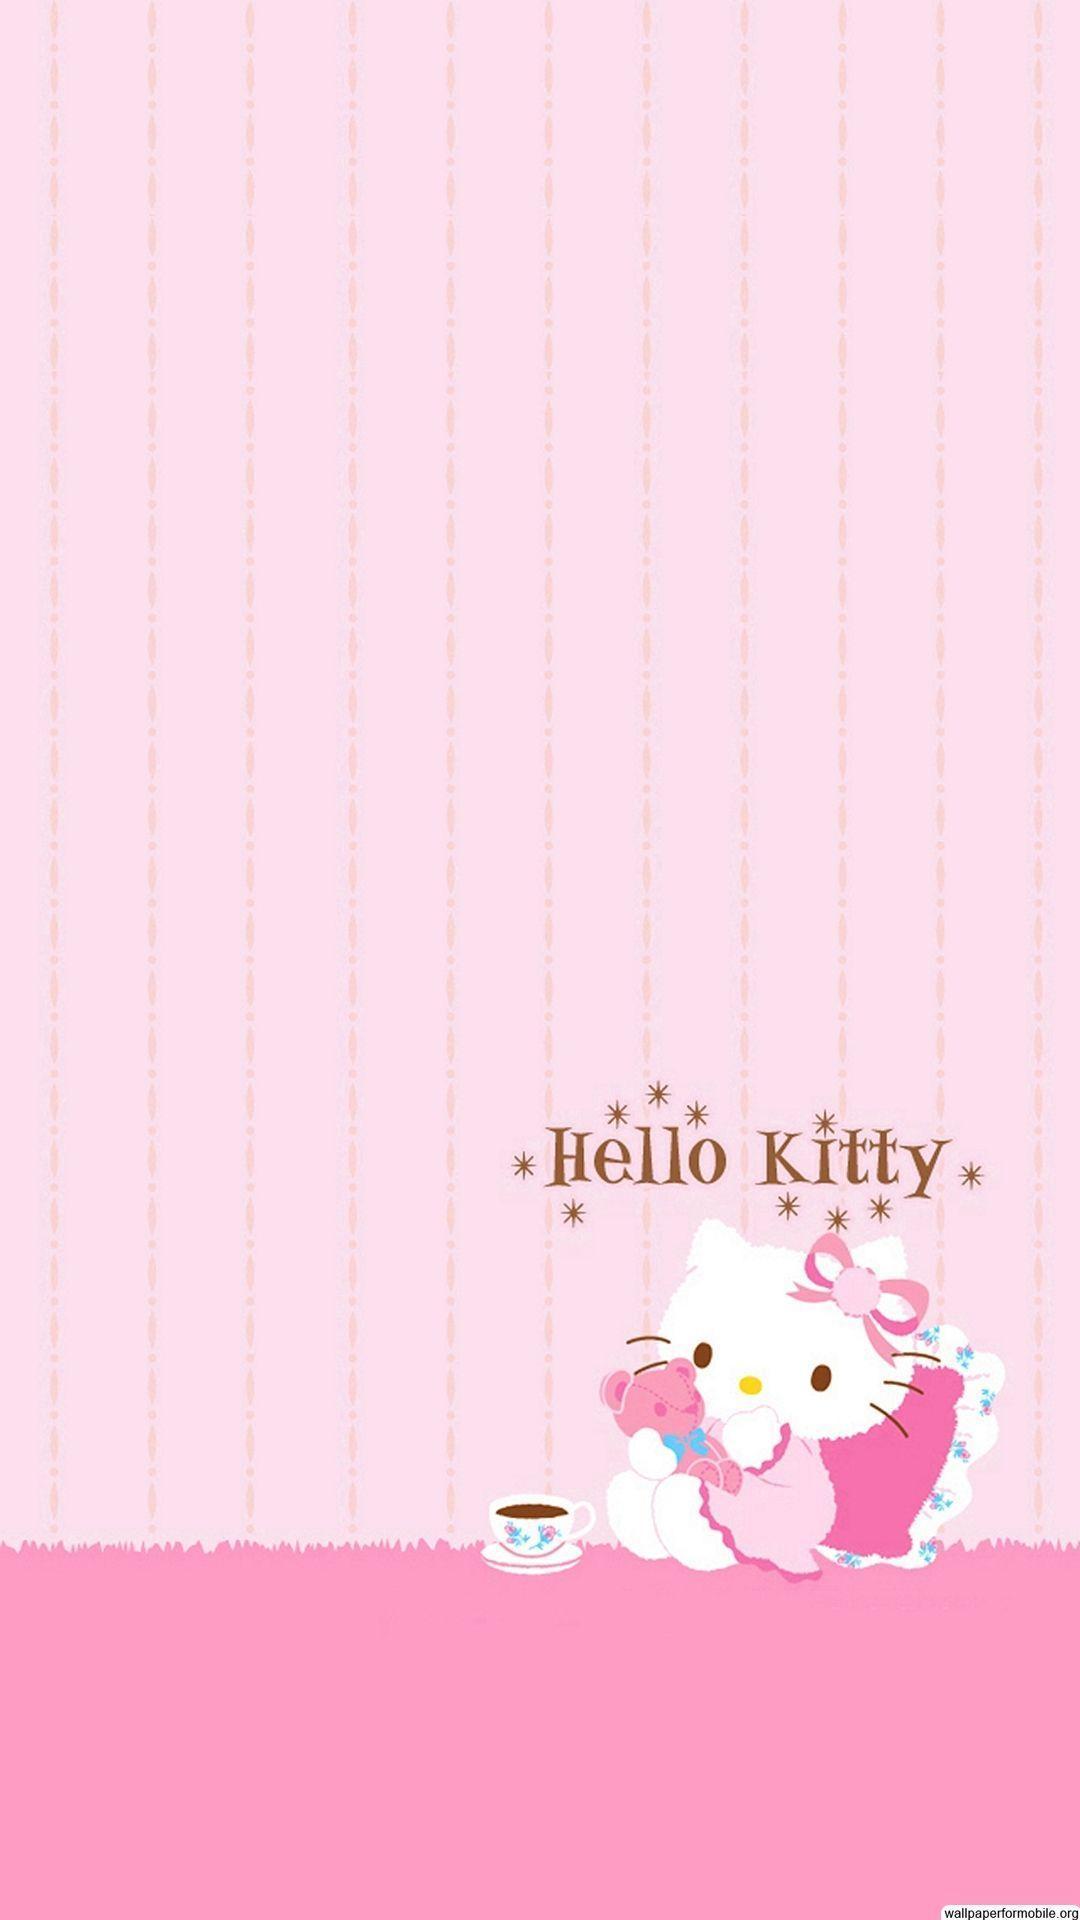 wallpaper iphone 5 pink kitty - photo #1